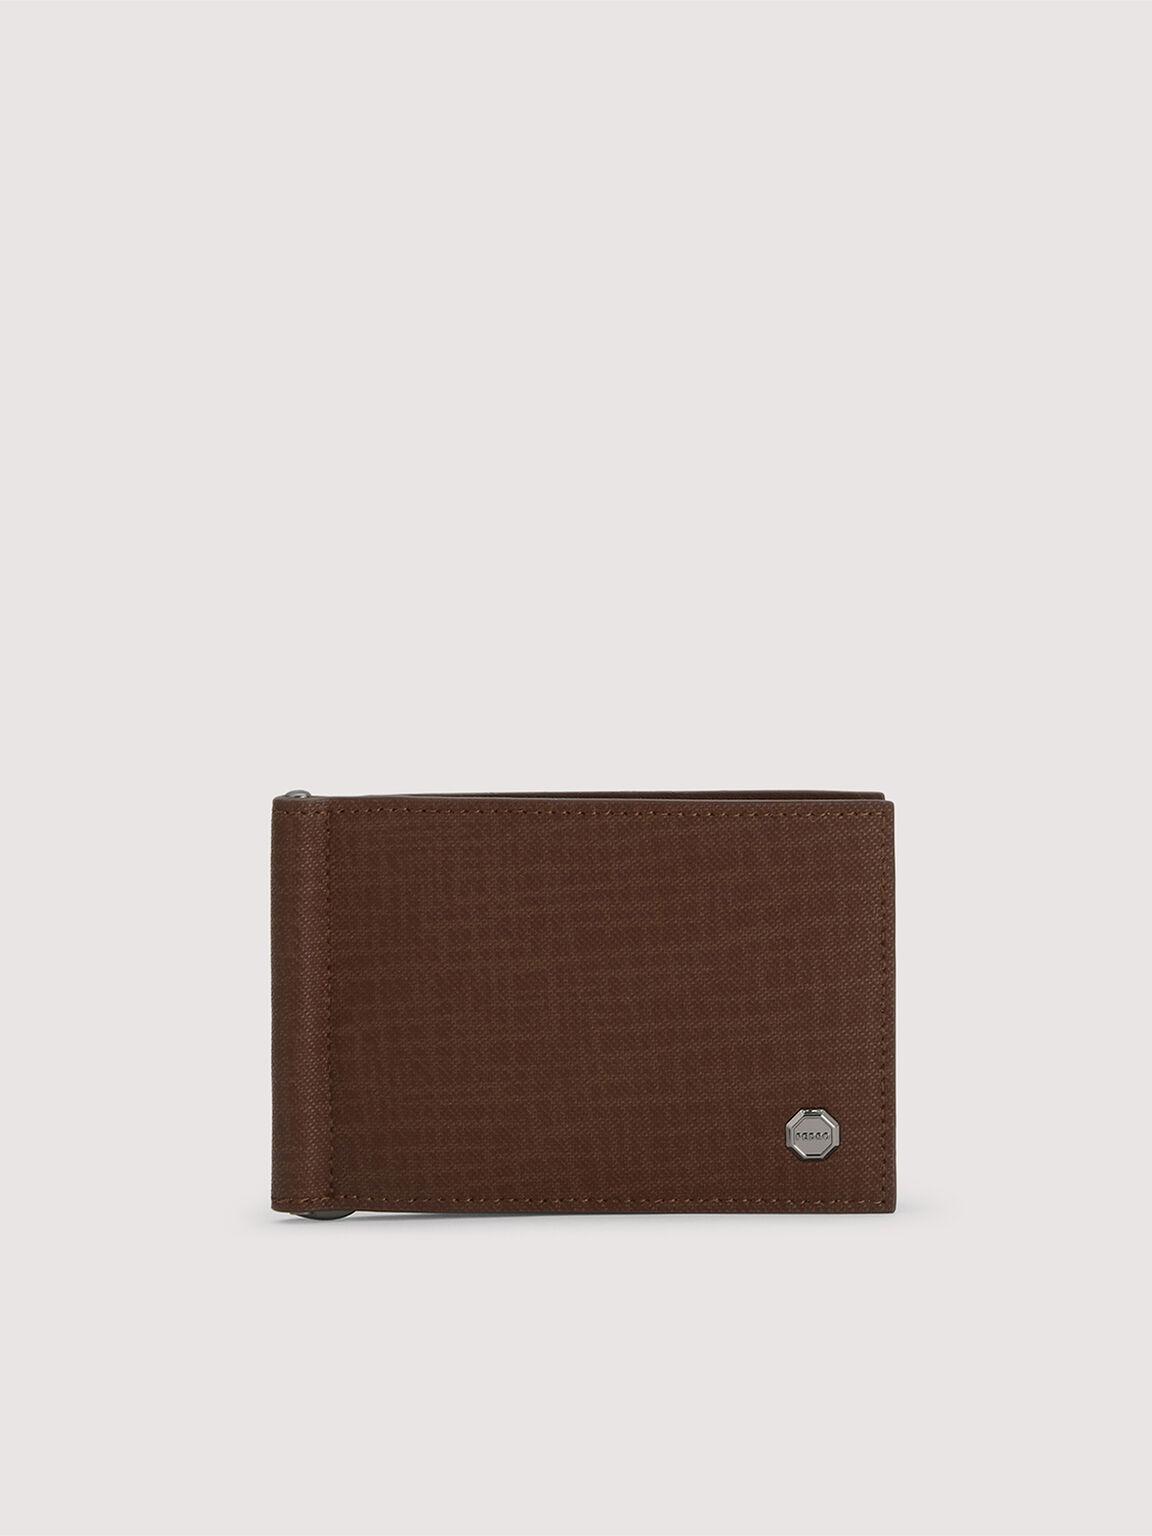 Leather Bi-Fold Cardholder with Money Clip, Brown, hi-res